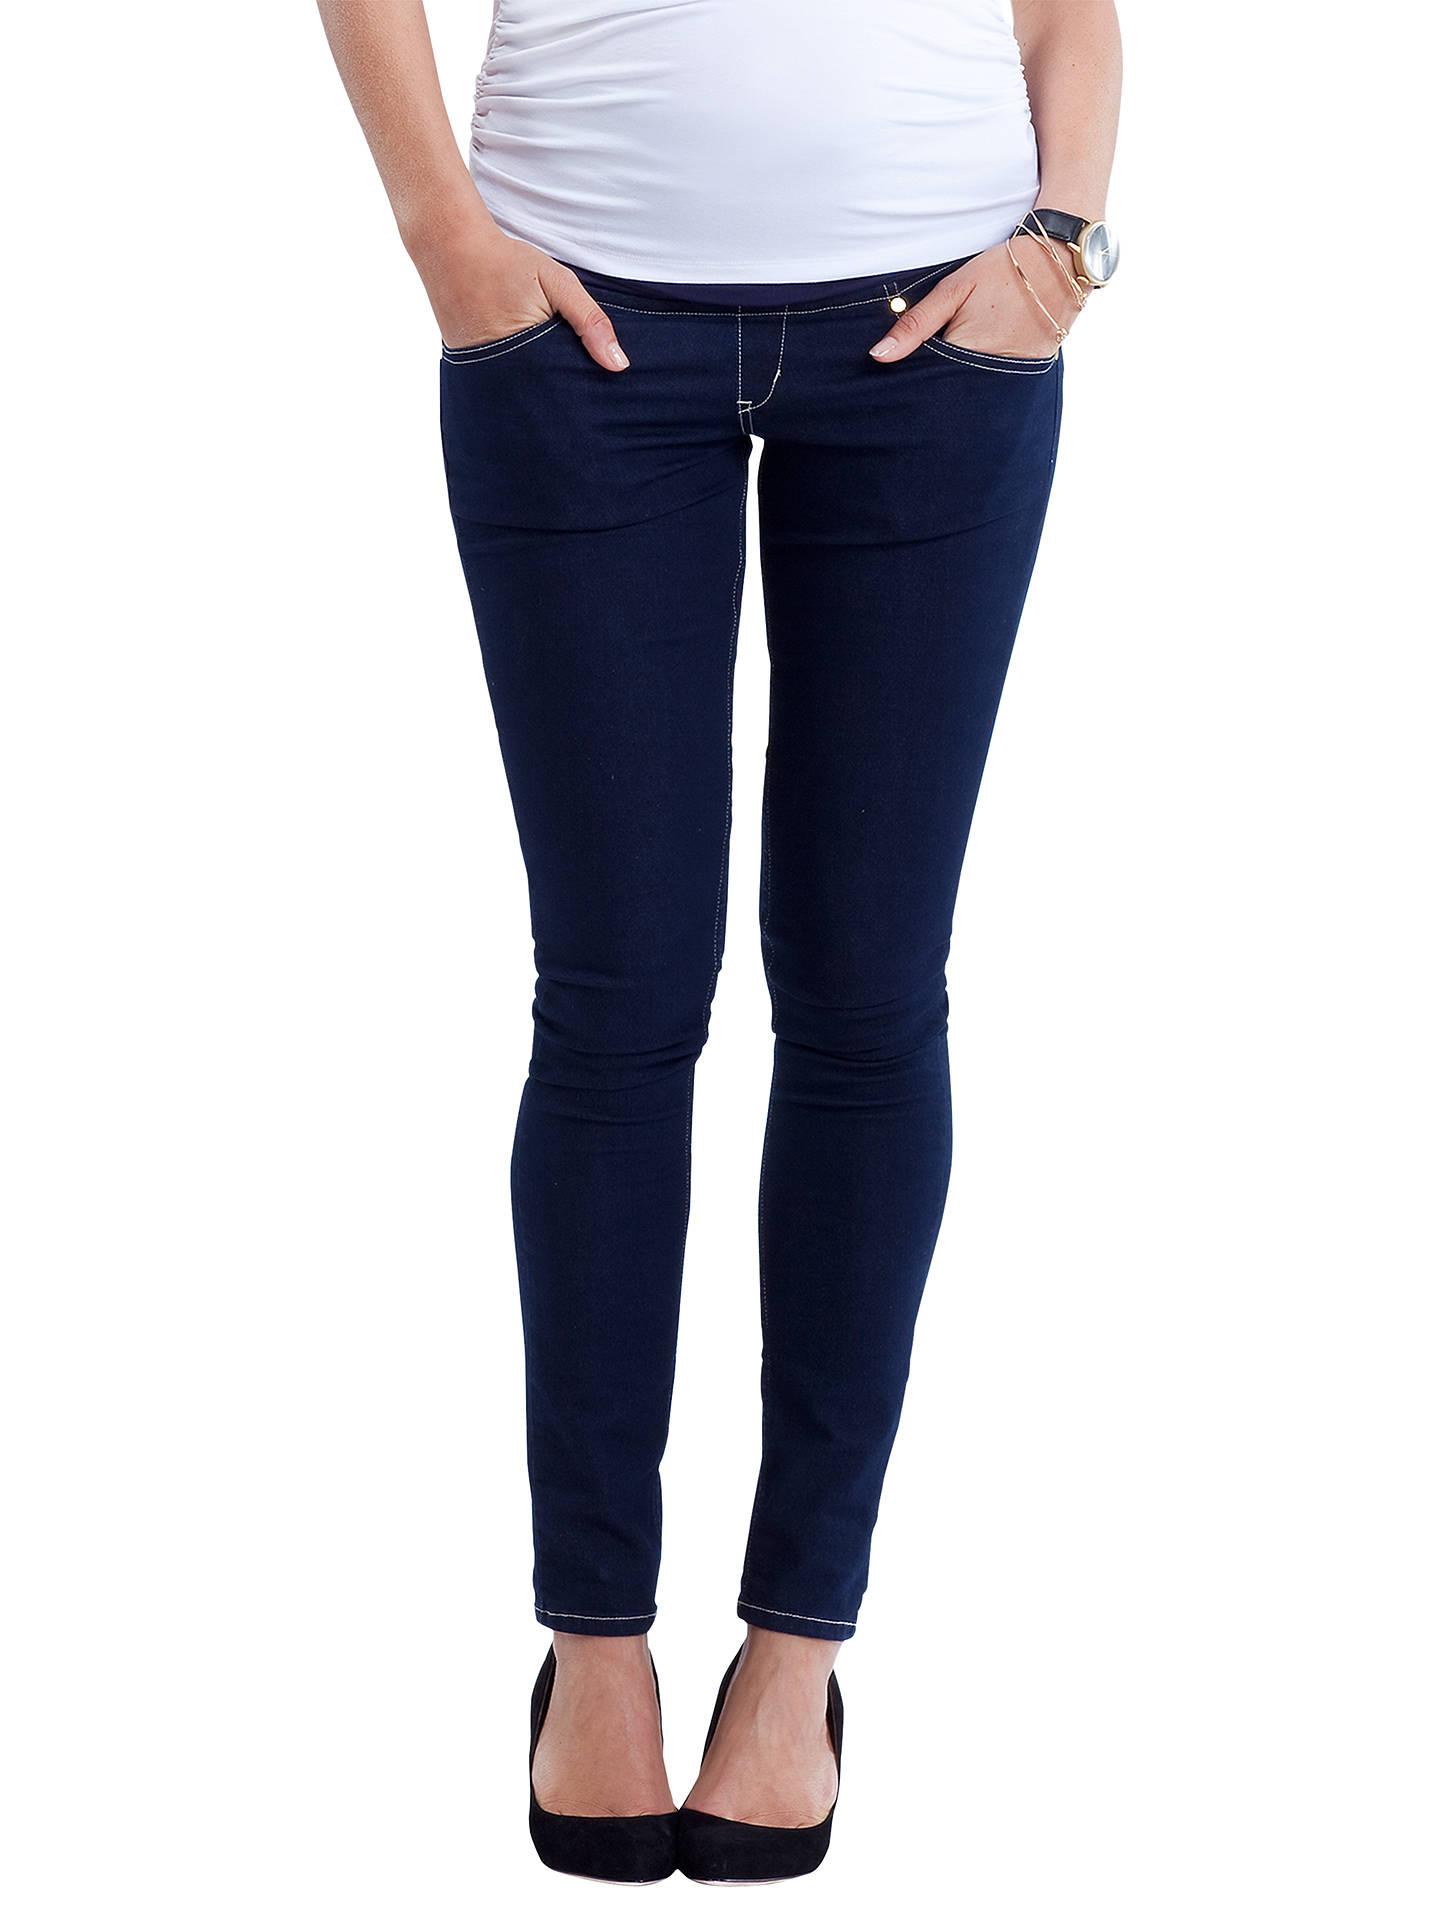 04dd2d9ab9c8a ... Buy Isabella Oliver Zadie Super Stretch Skinny Denim Maternity Jeans,  Indigo, 8 Online at ...